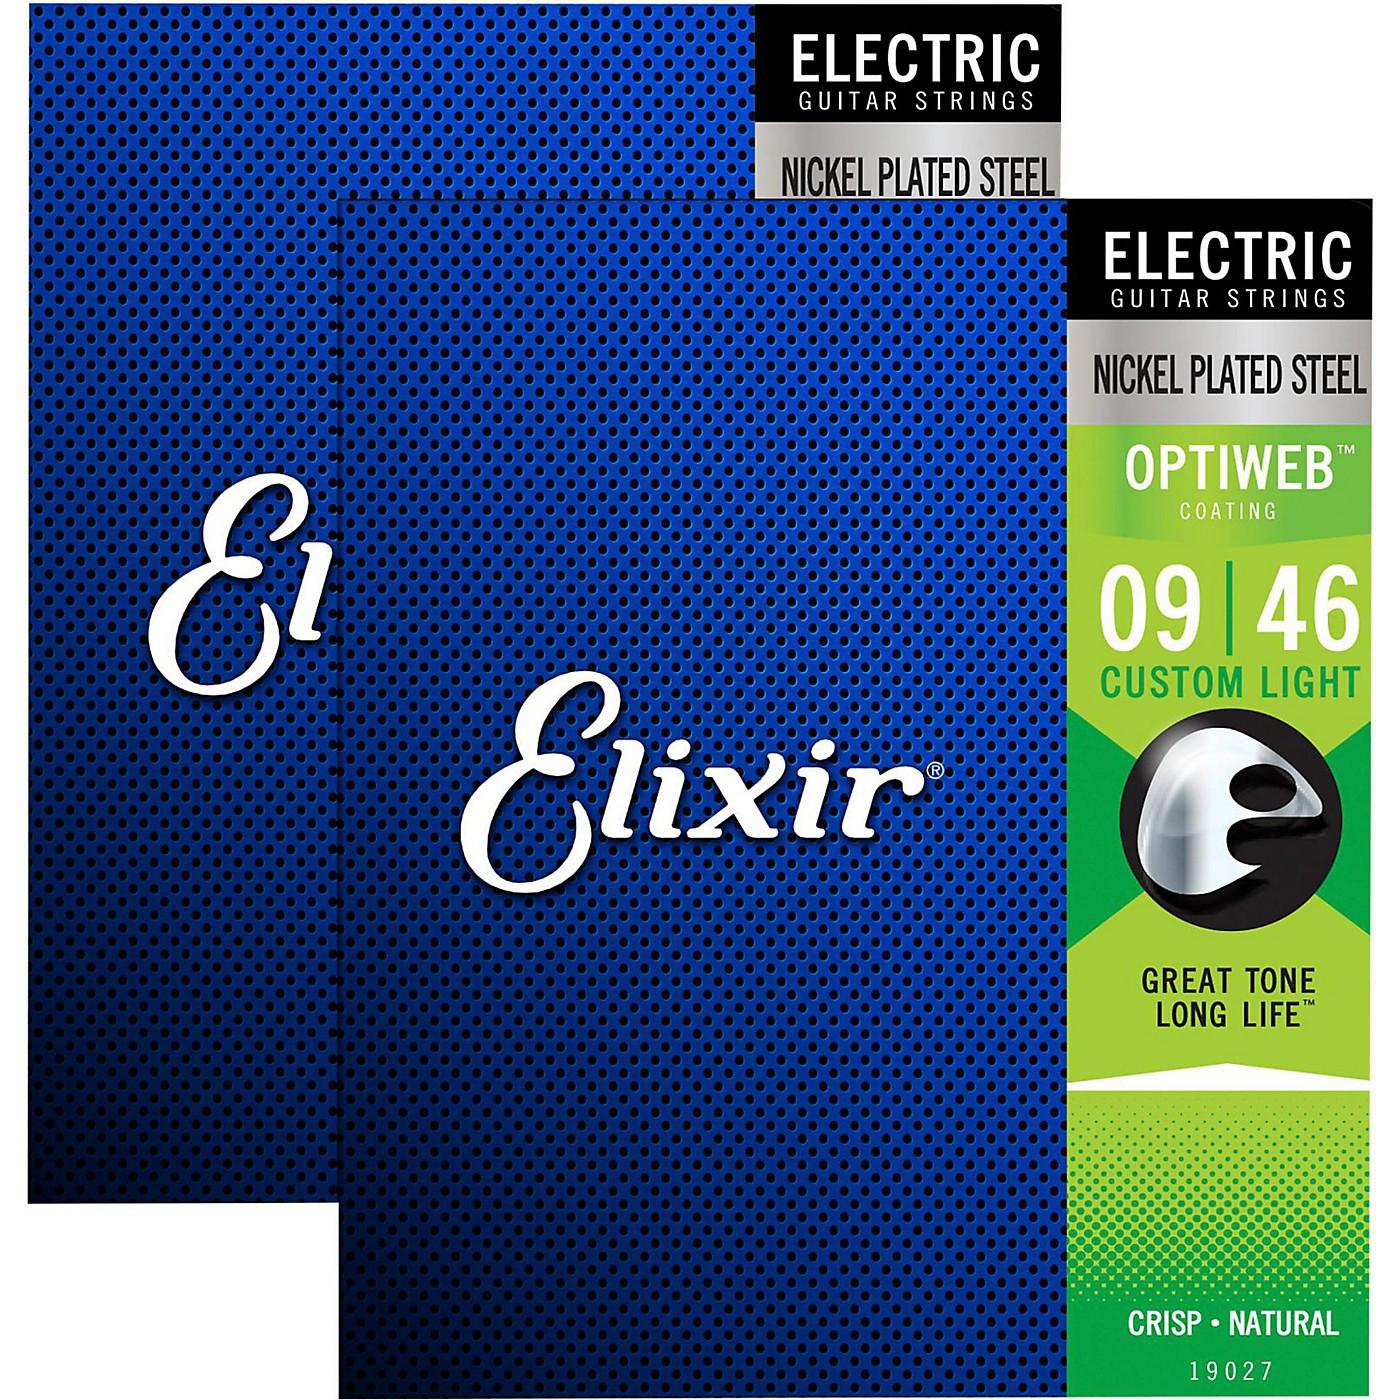 Elixir Electric Guitar Strings with OPTIWEB Coating, Custom Light (.009-.046) - 2 Pack thumbnail